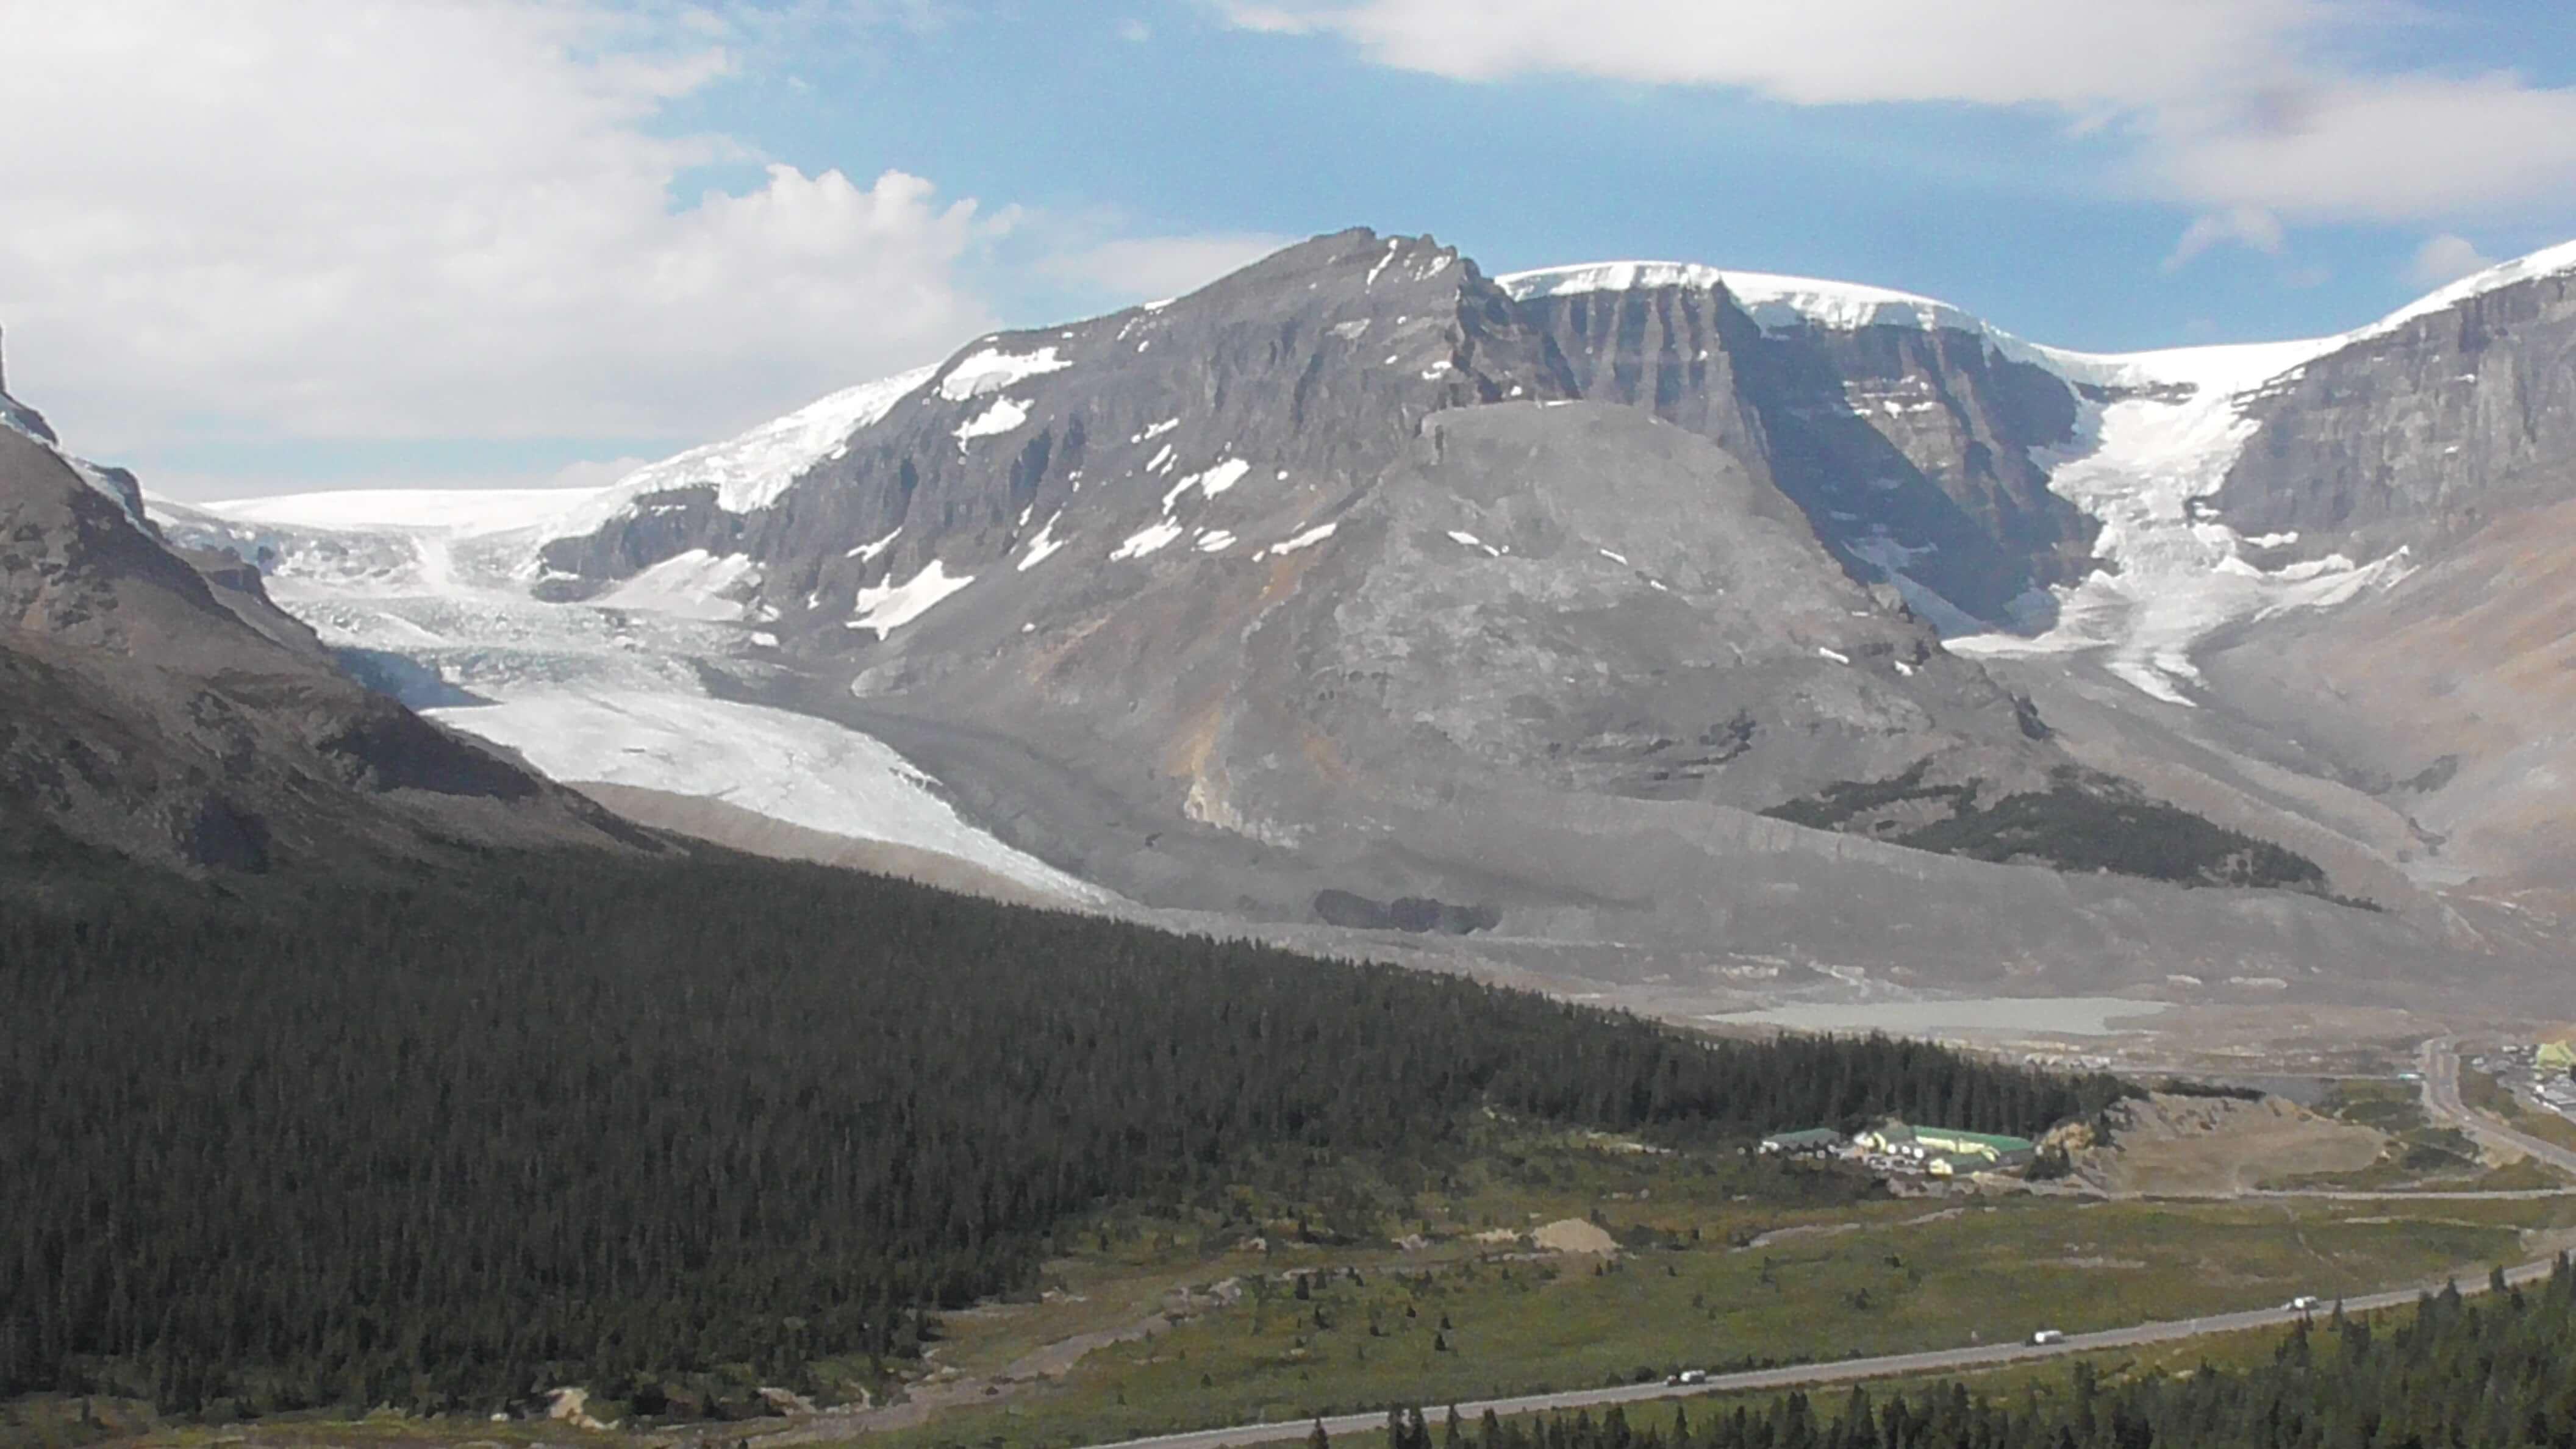 Athabasca Glacier and Dome Glacier, Jasper National Park, Alberta